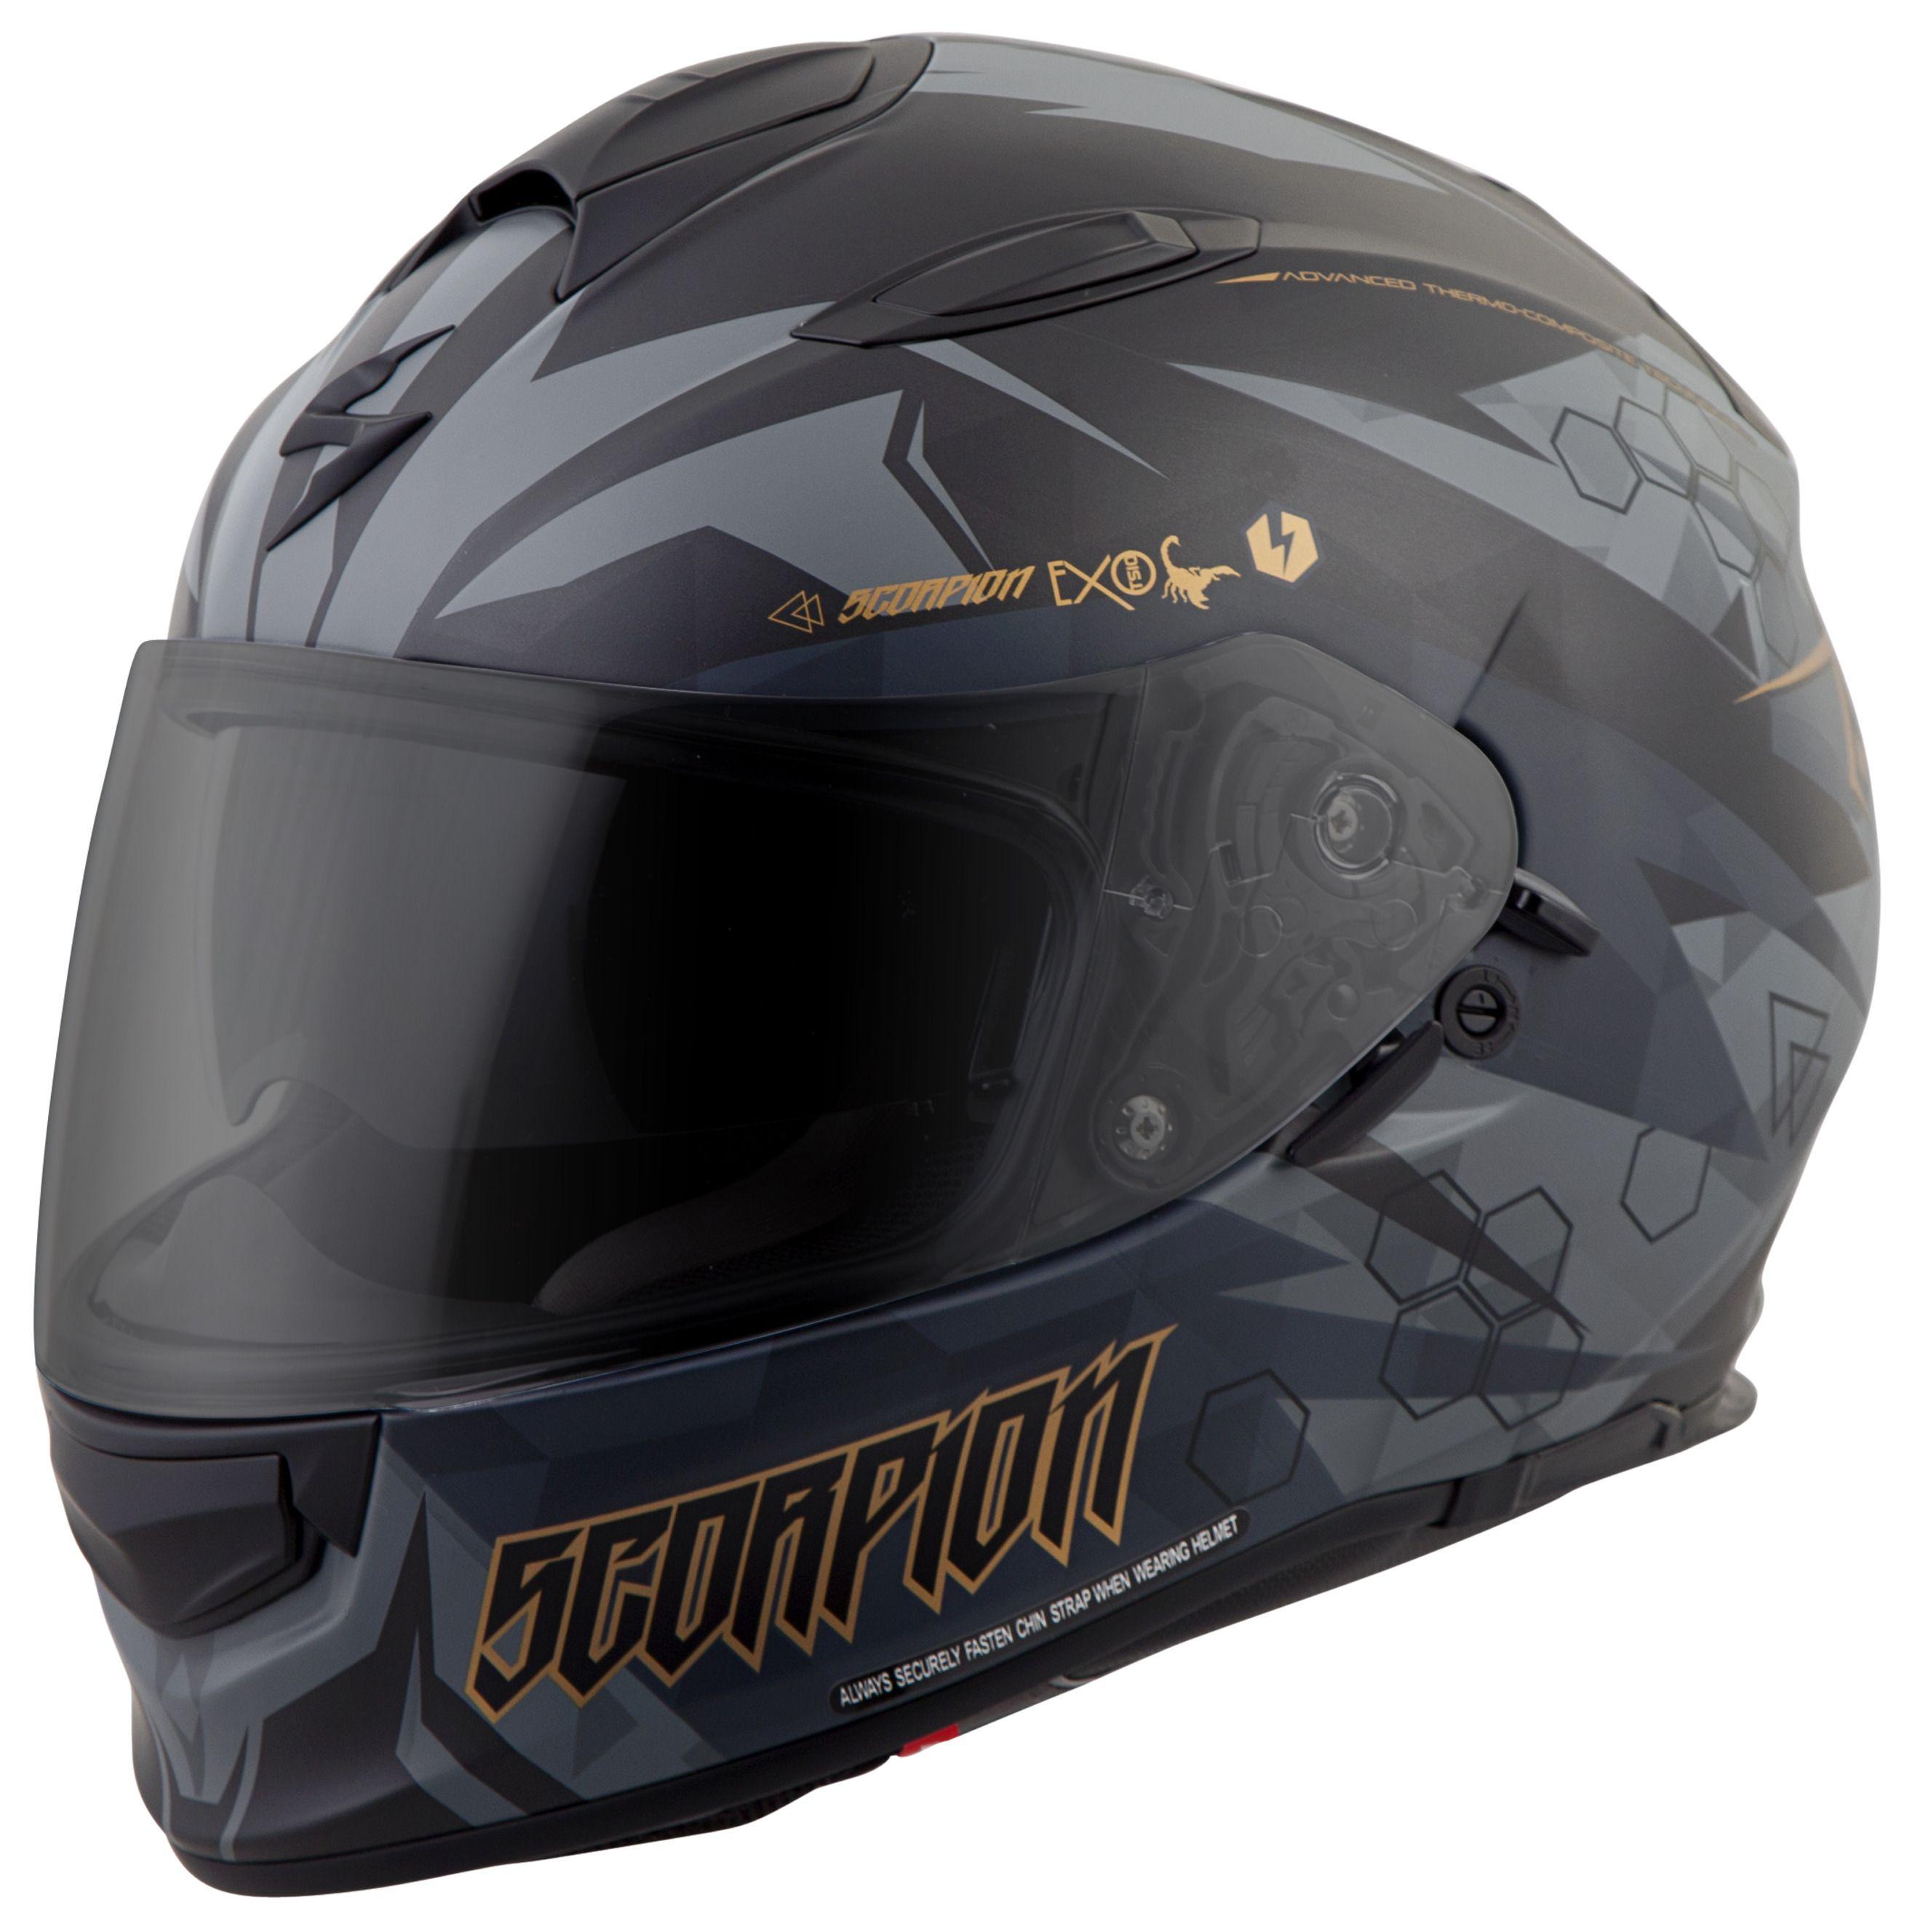 scorpion exo gt3000 helmet cycle gear. Black Bedroom Furniture Sets. Home Design Ideas